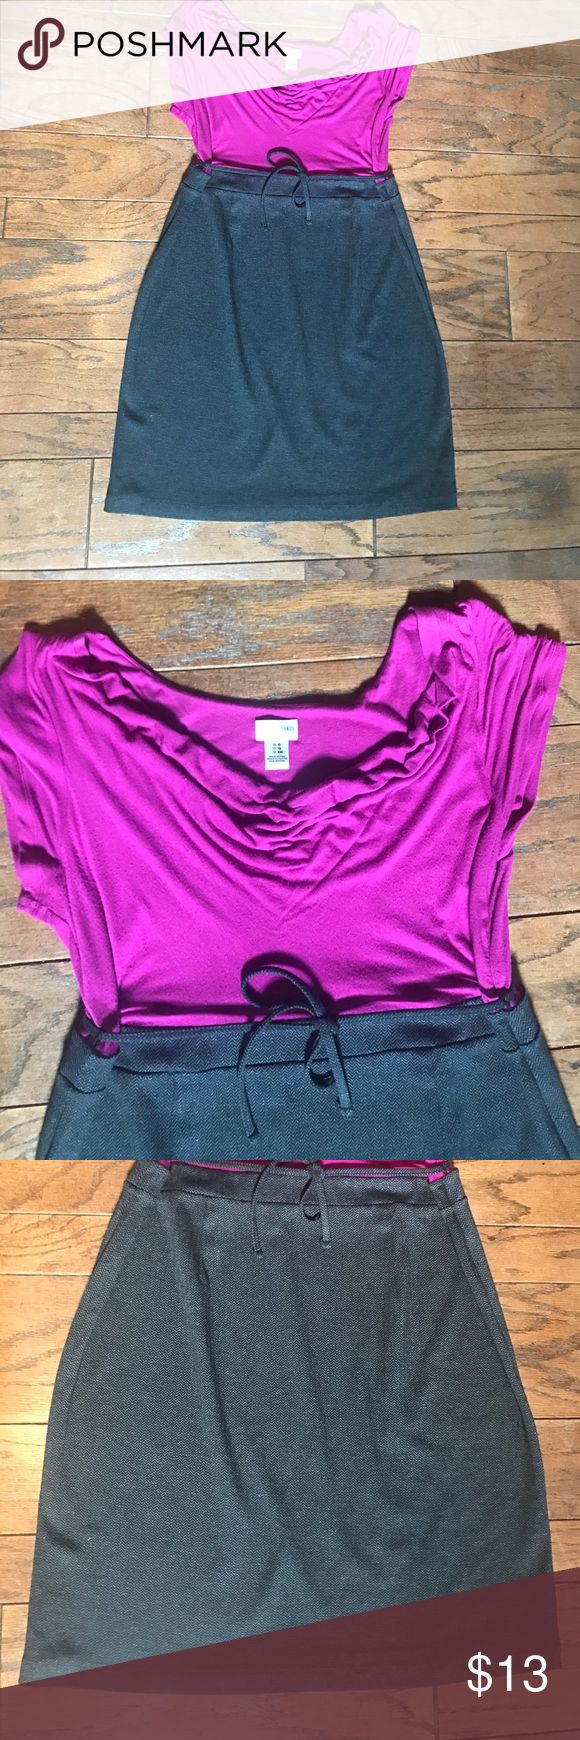 Motherhood pink/grey maternity dress GUC pink/grey maternity dress. Size XL Motherhood Dresses Midi